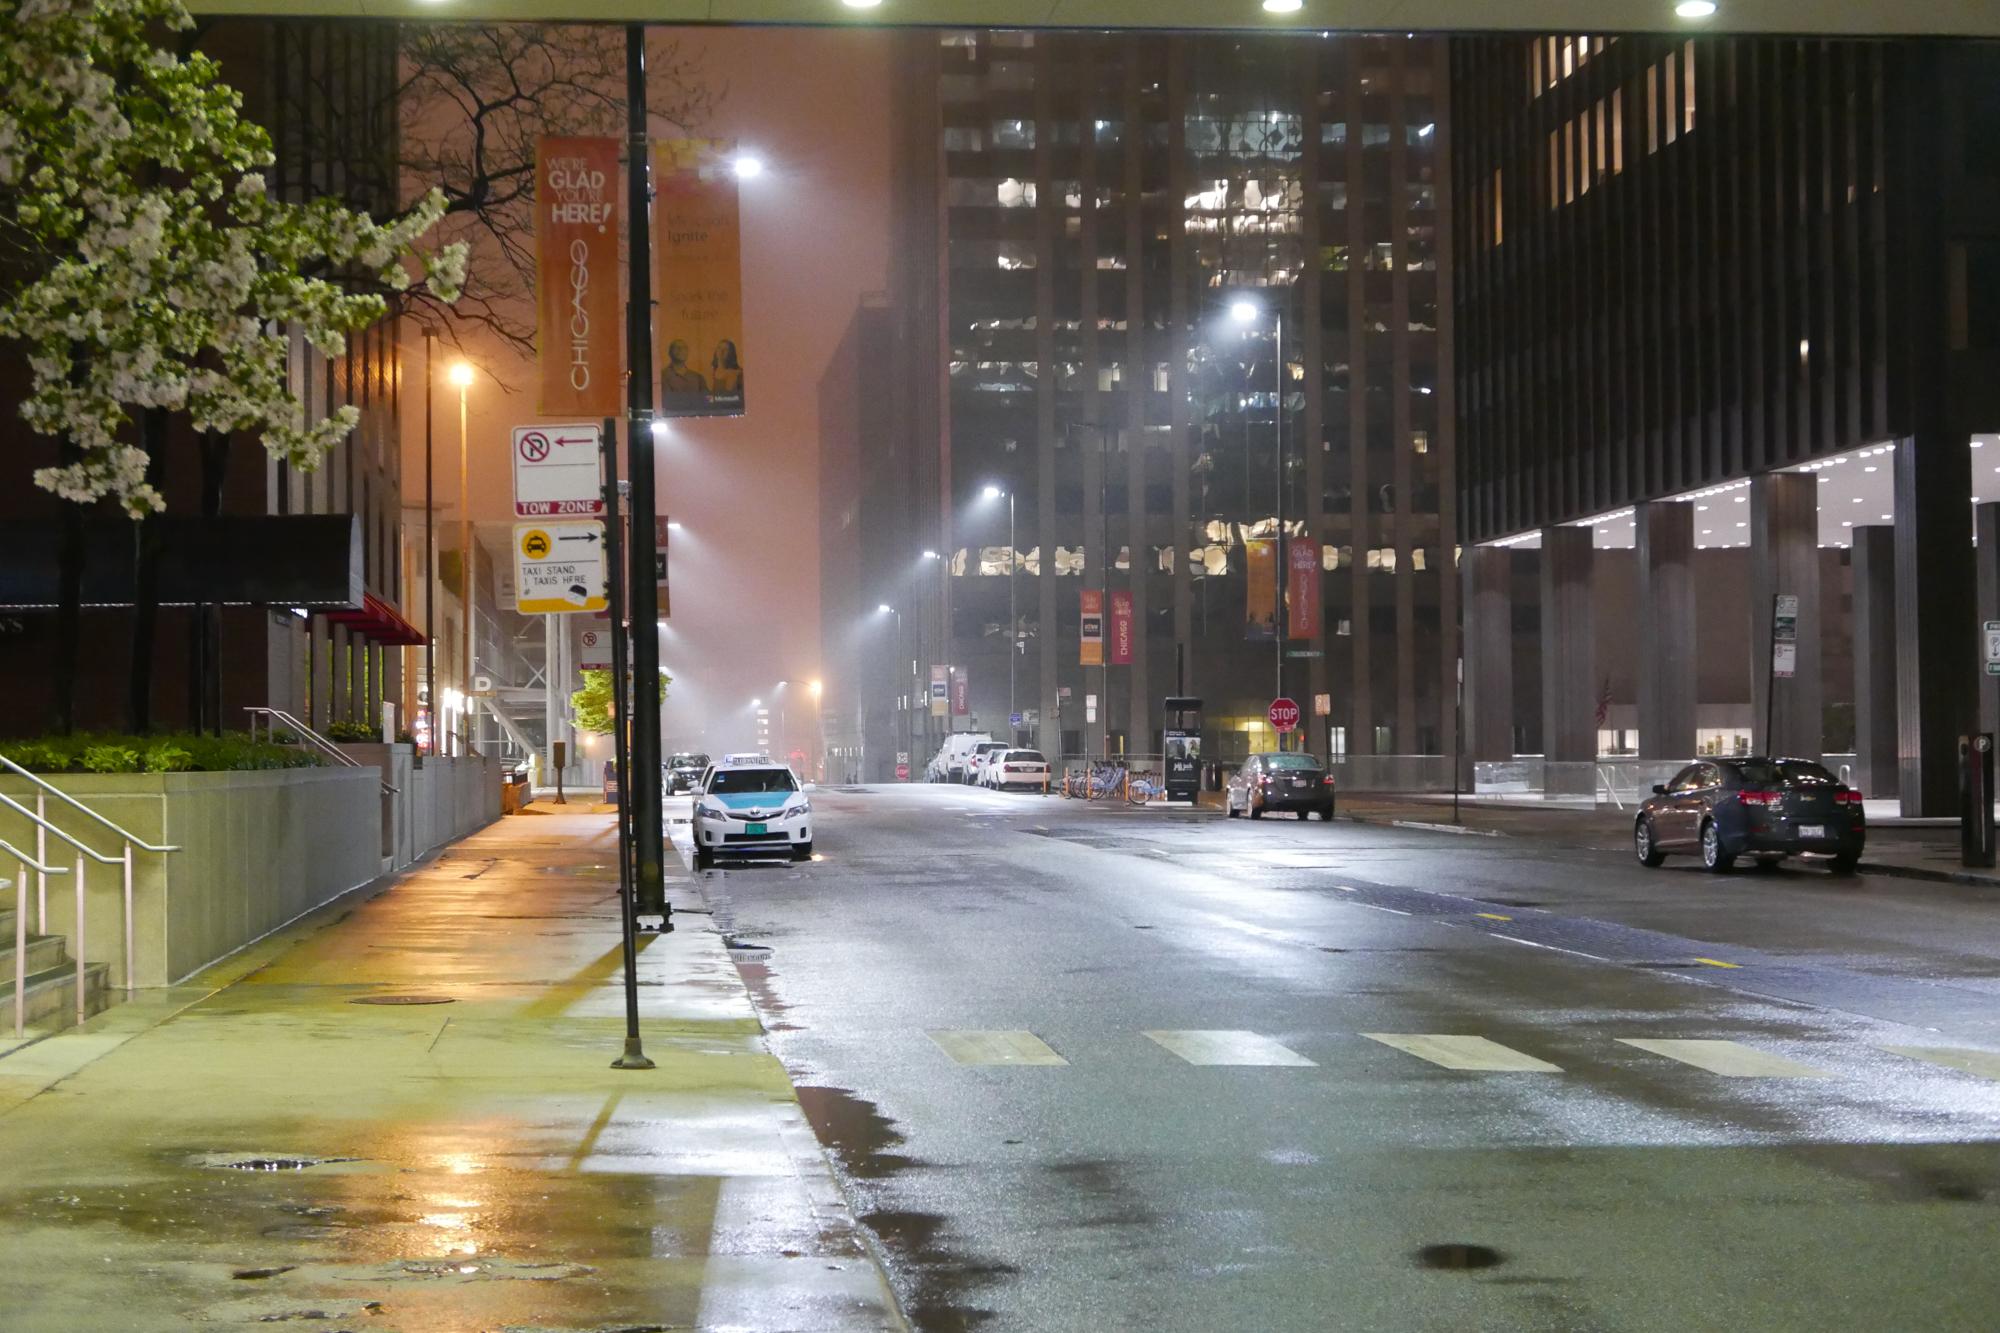 pastel night, downtown